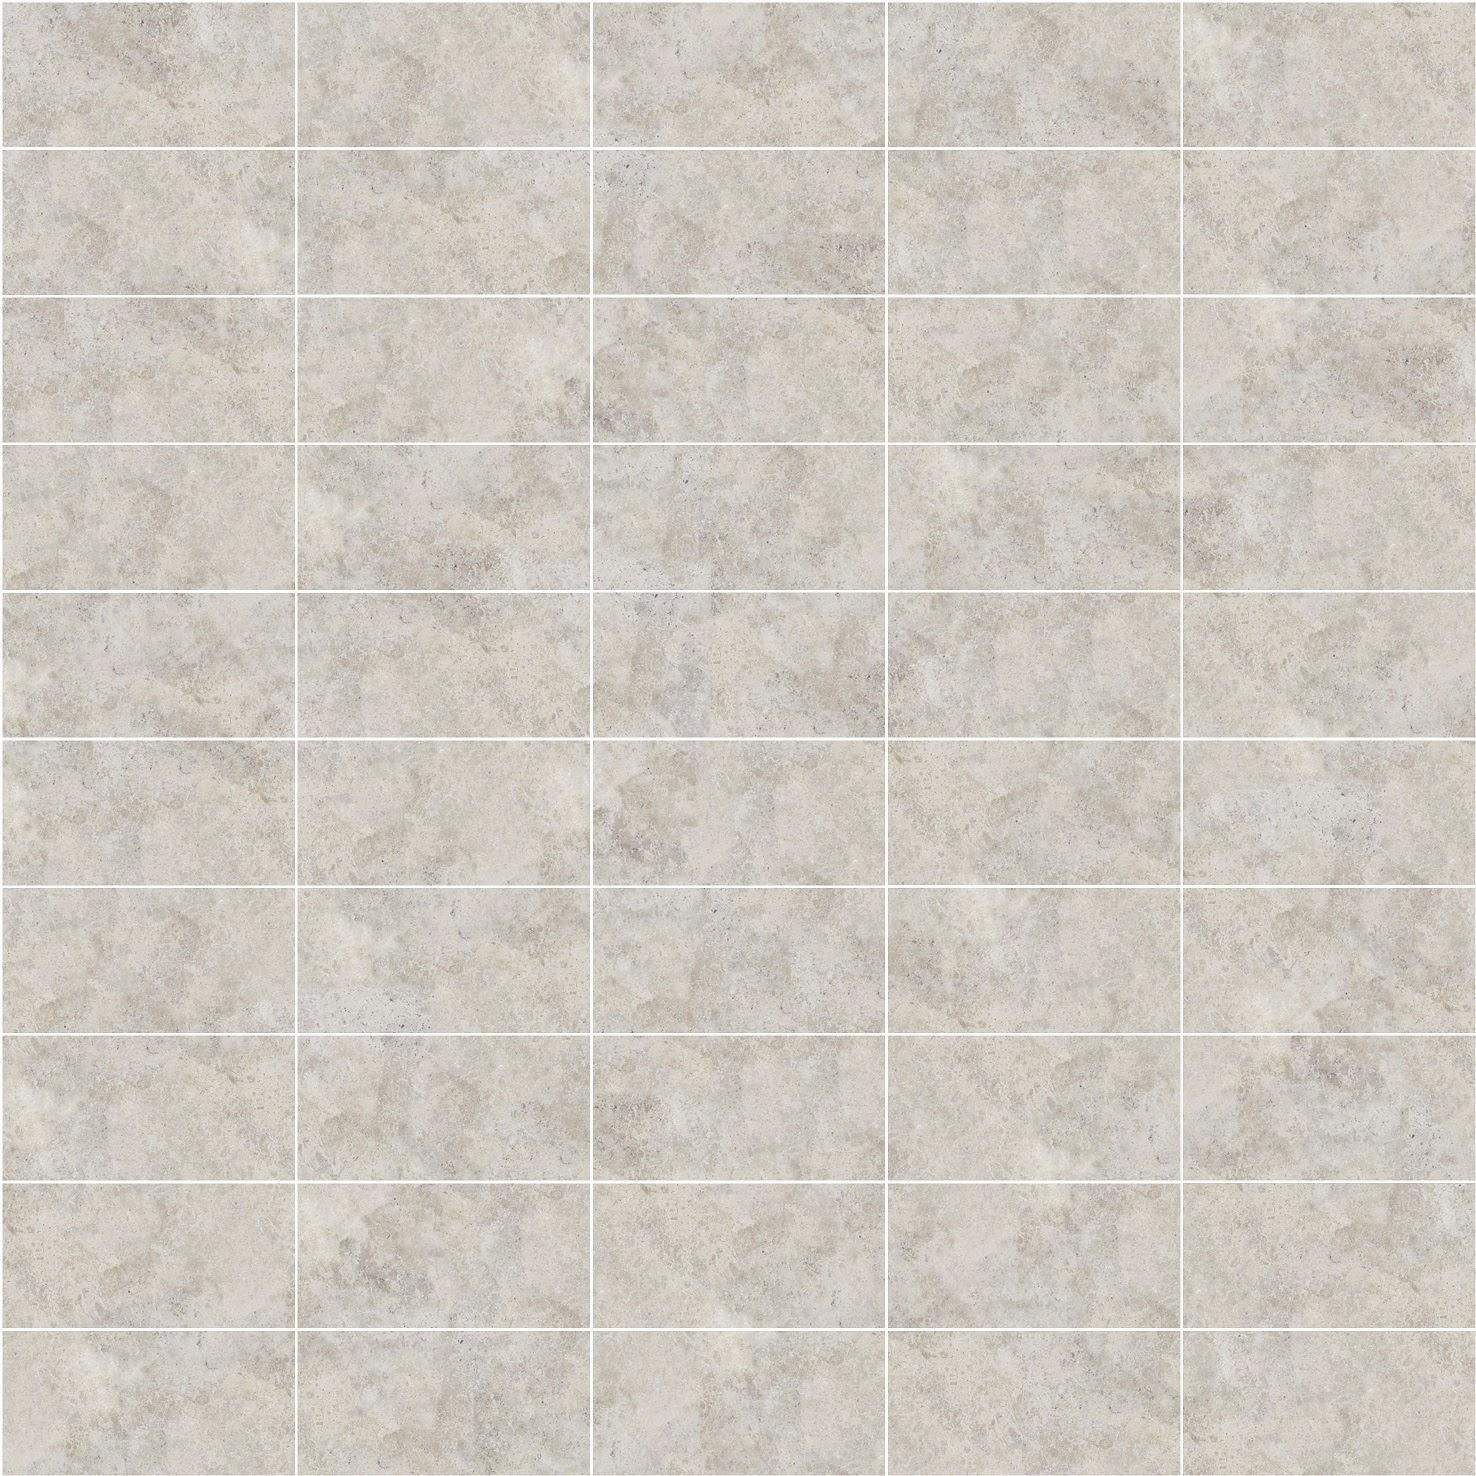 Simo marzo 2014 for Grey bathroom floor tiles texture